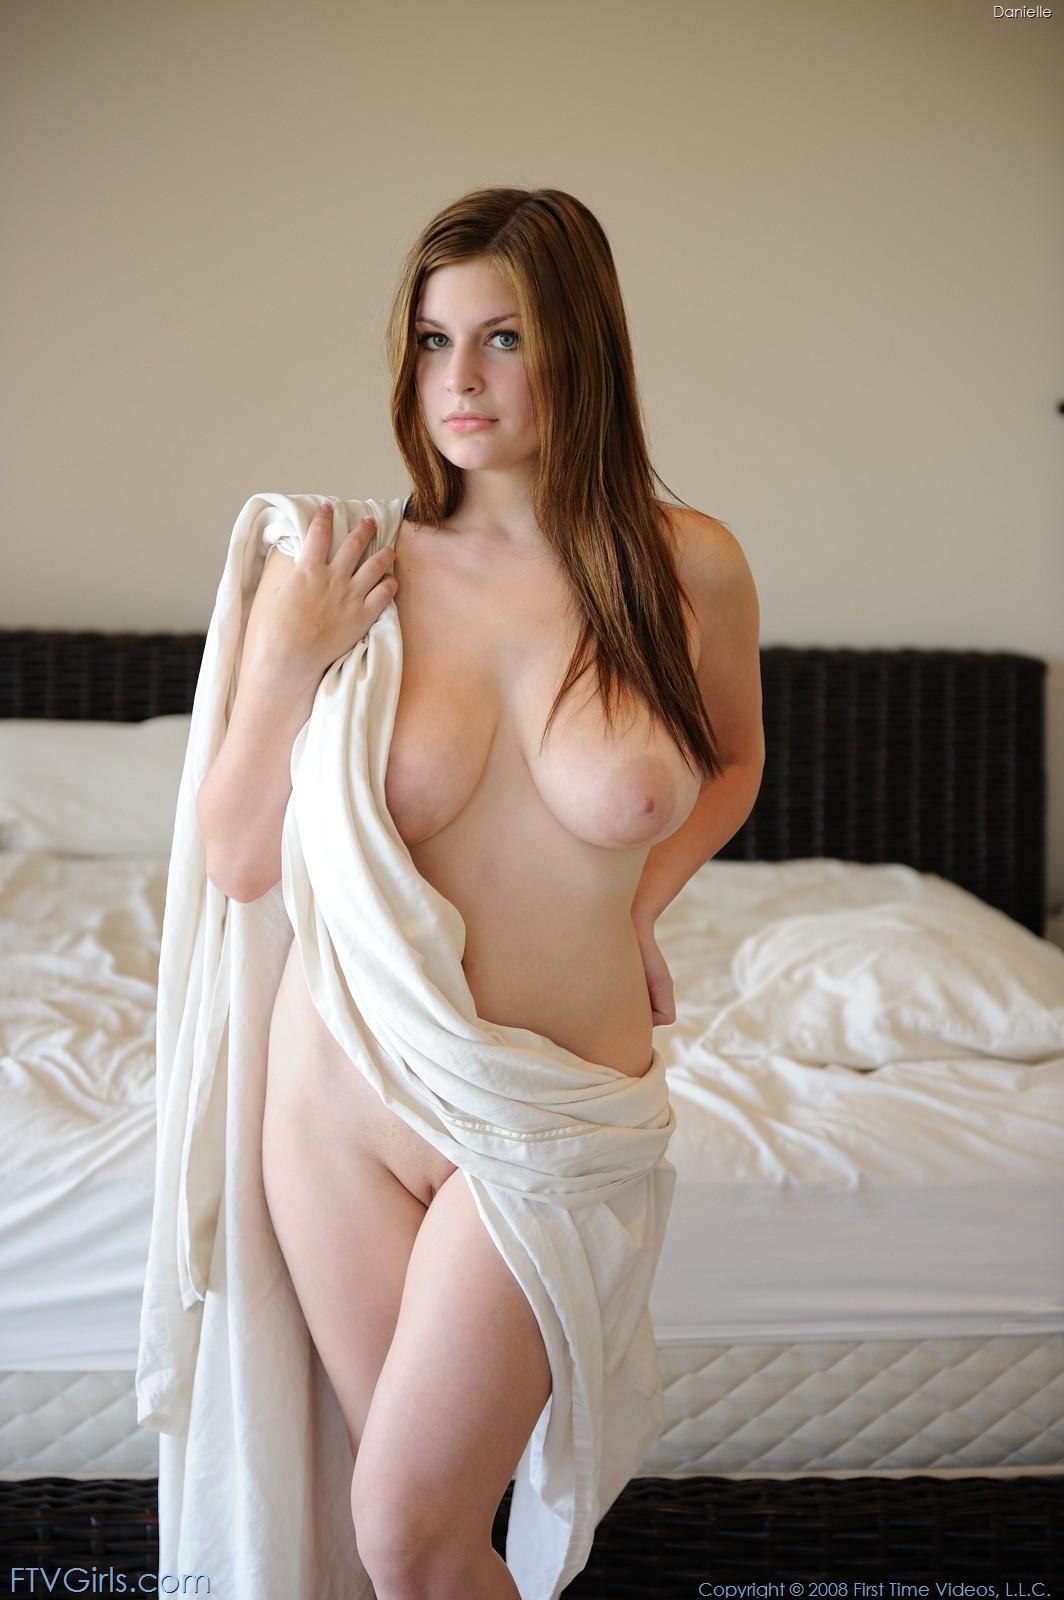 riesige titten nackt selfie